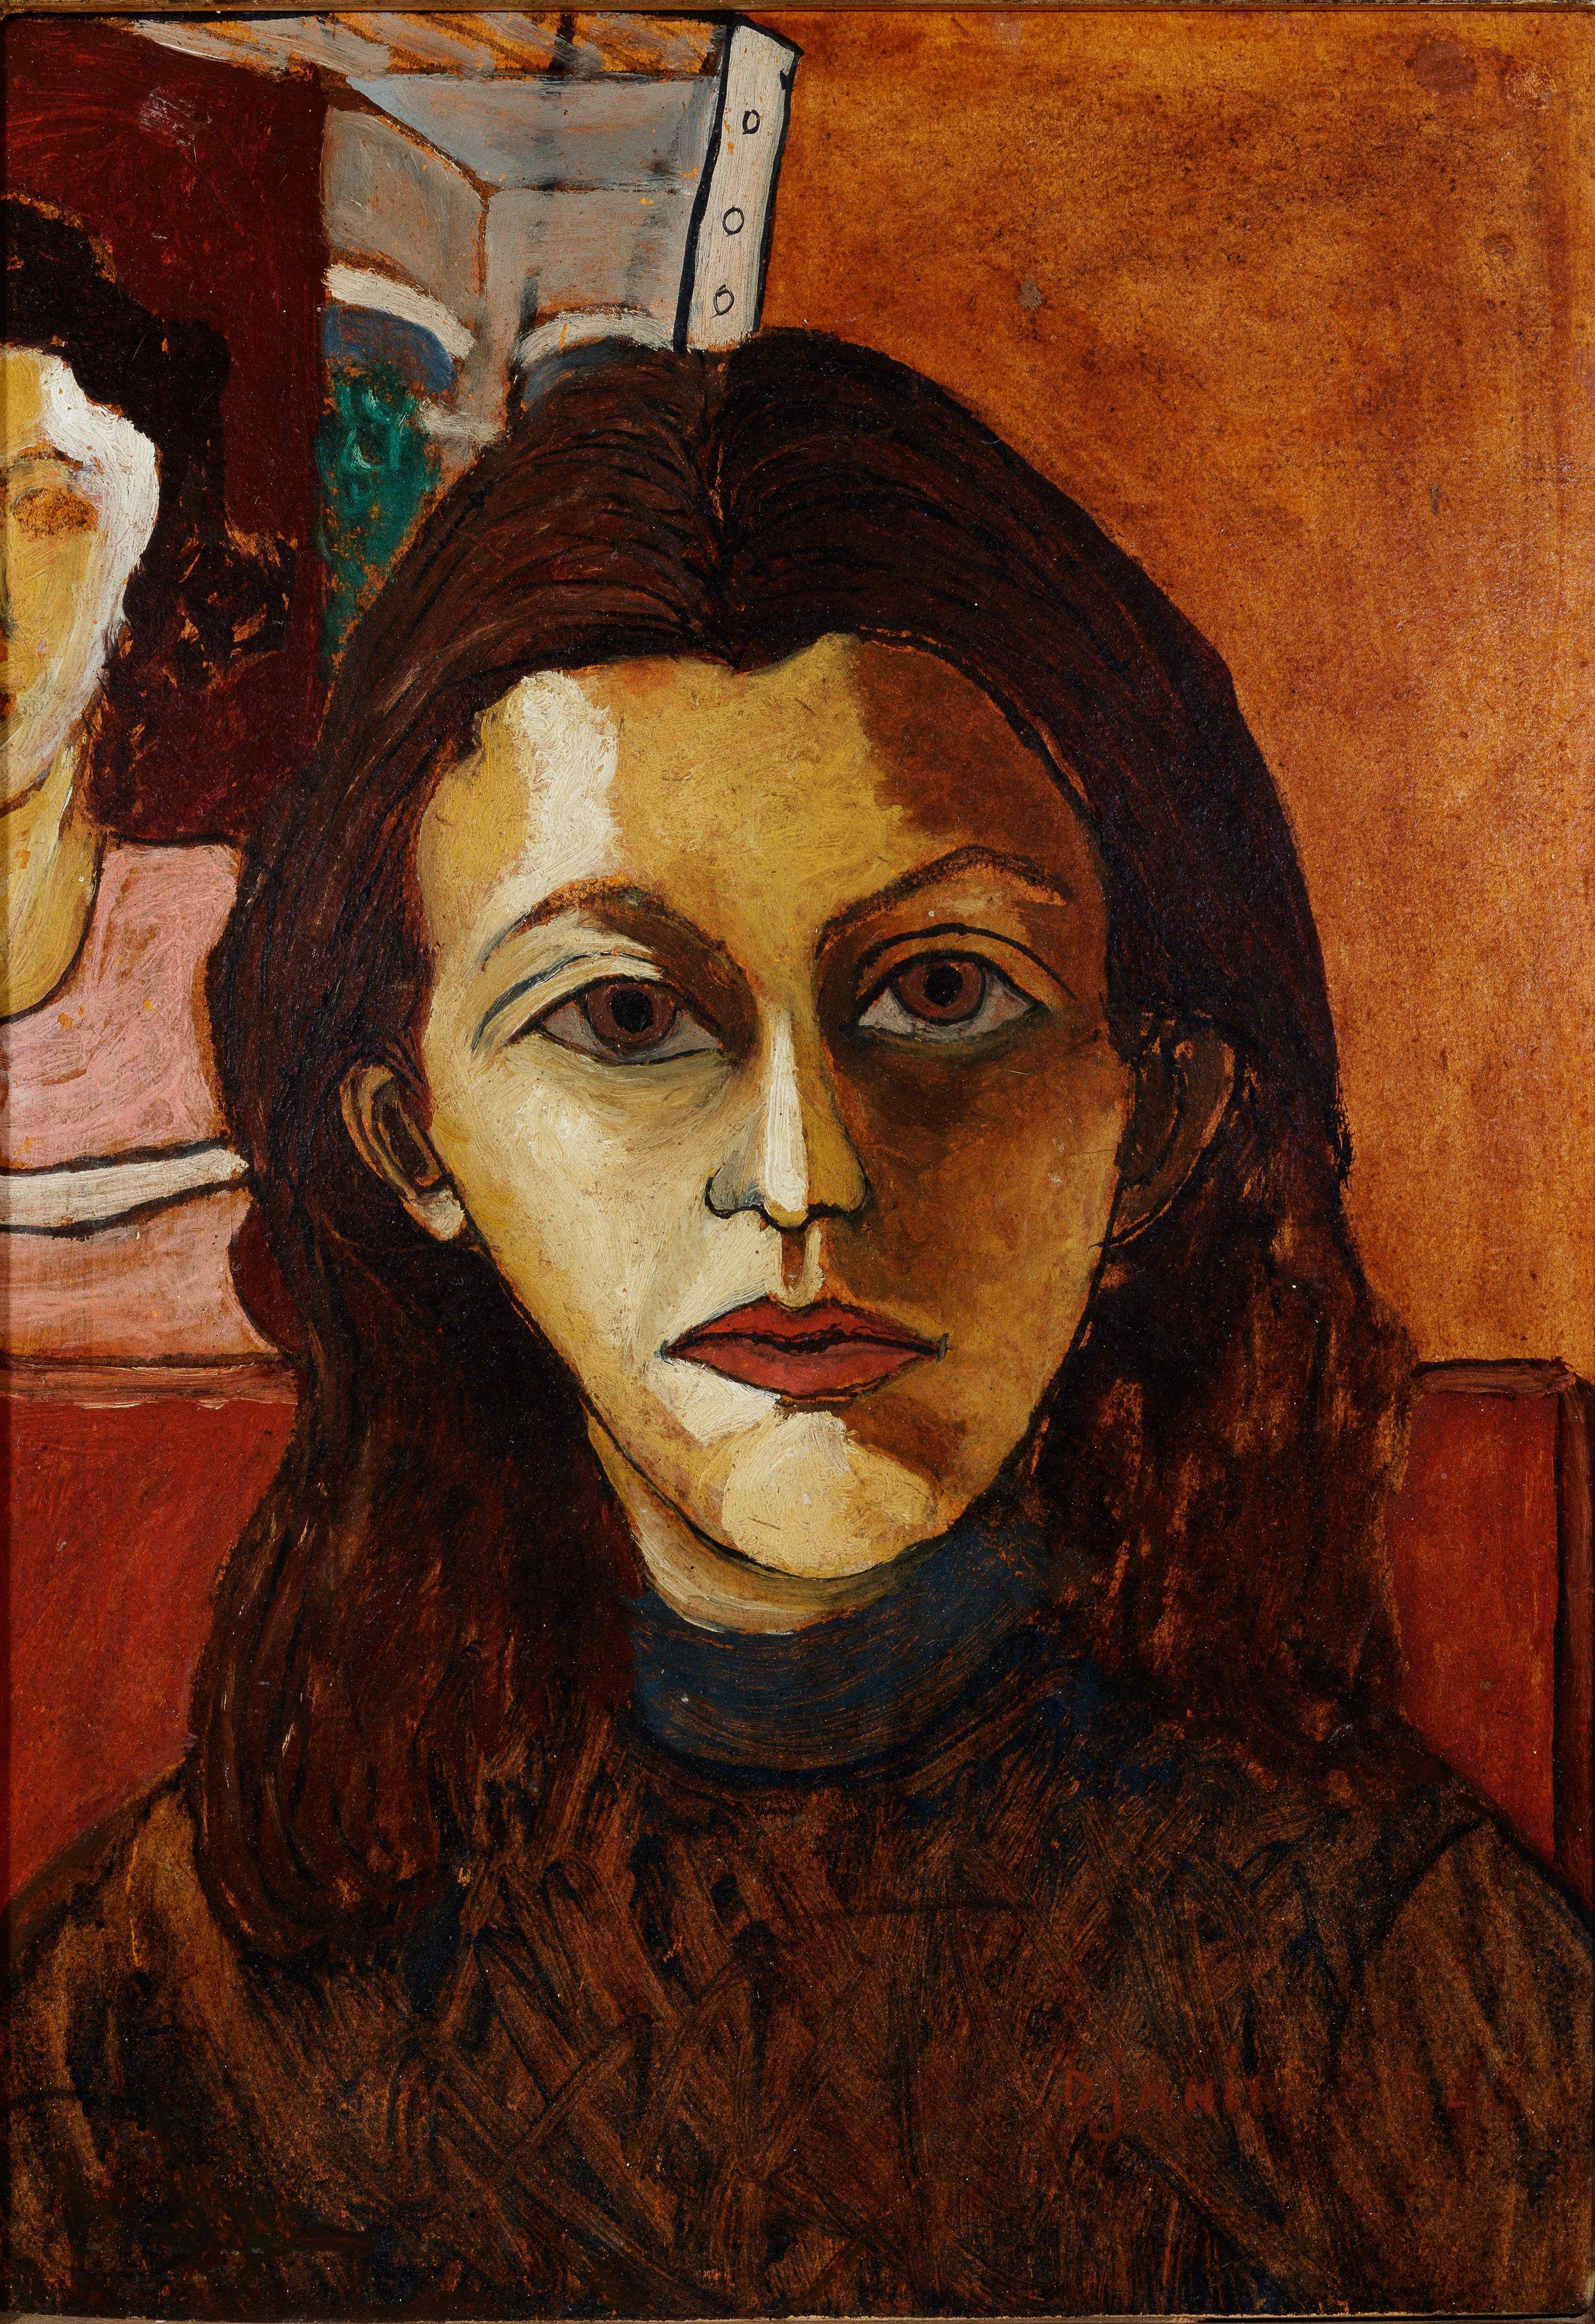 Djanira, Autorretrato,  1944, ´´oleo sobre madeira, 48 x 35 cm / Foto: Jaime Acioli